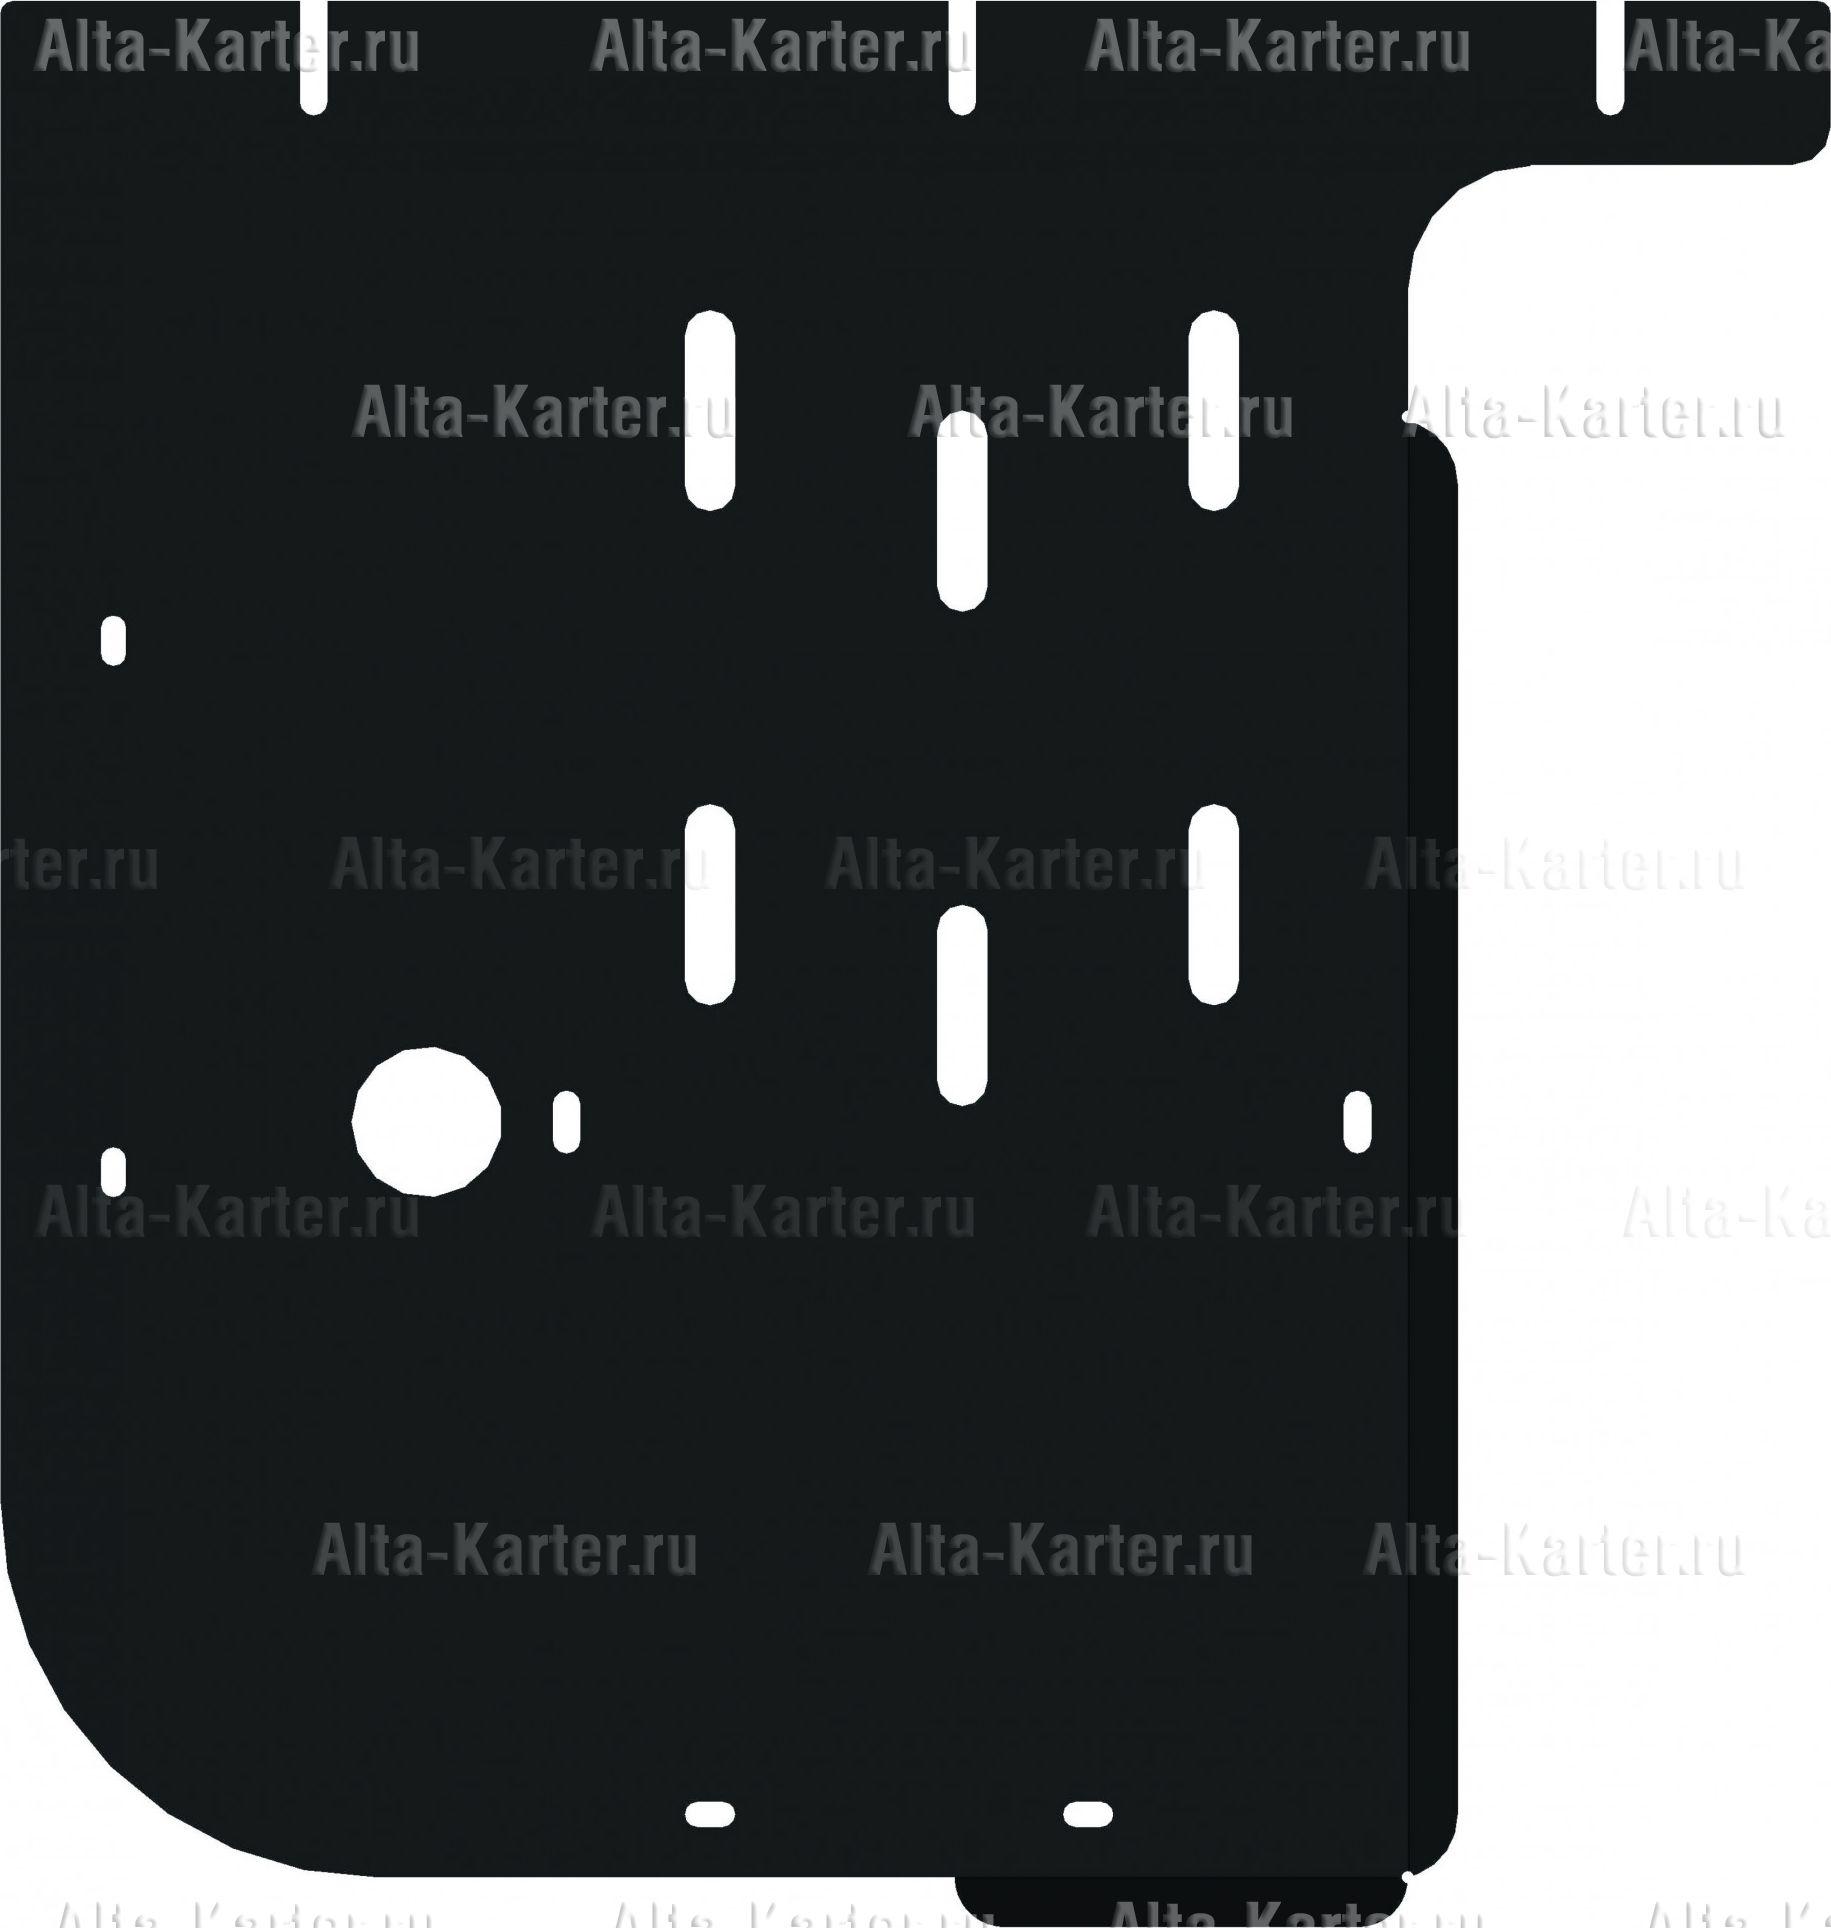 Защита Alfeco для КПП BMW 1-серия E81 2007-2011. Артикул ALF.34.15